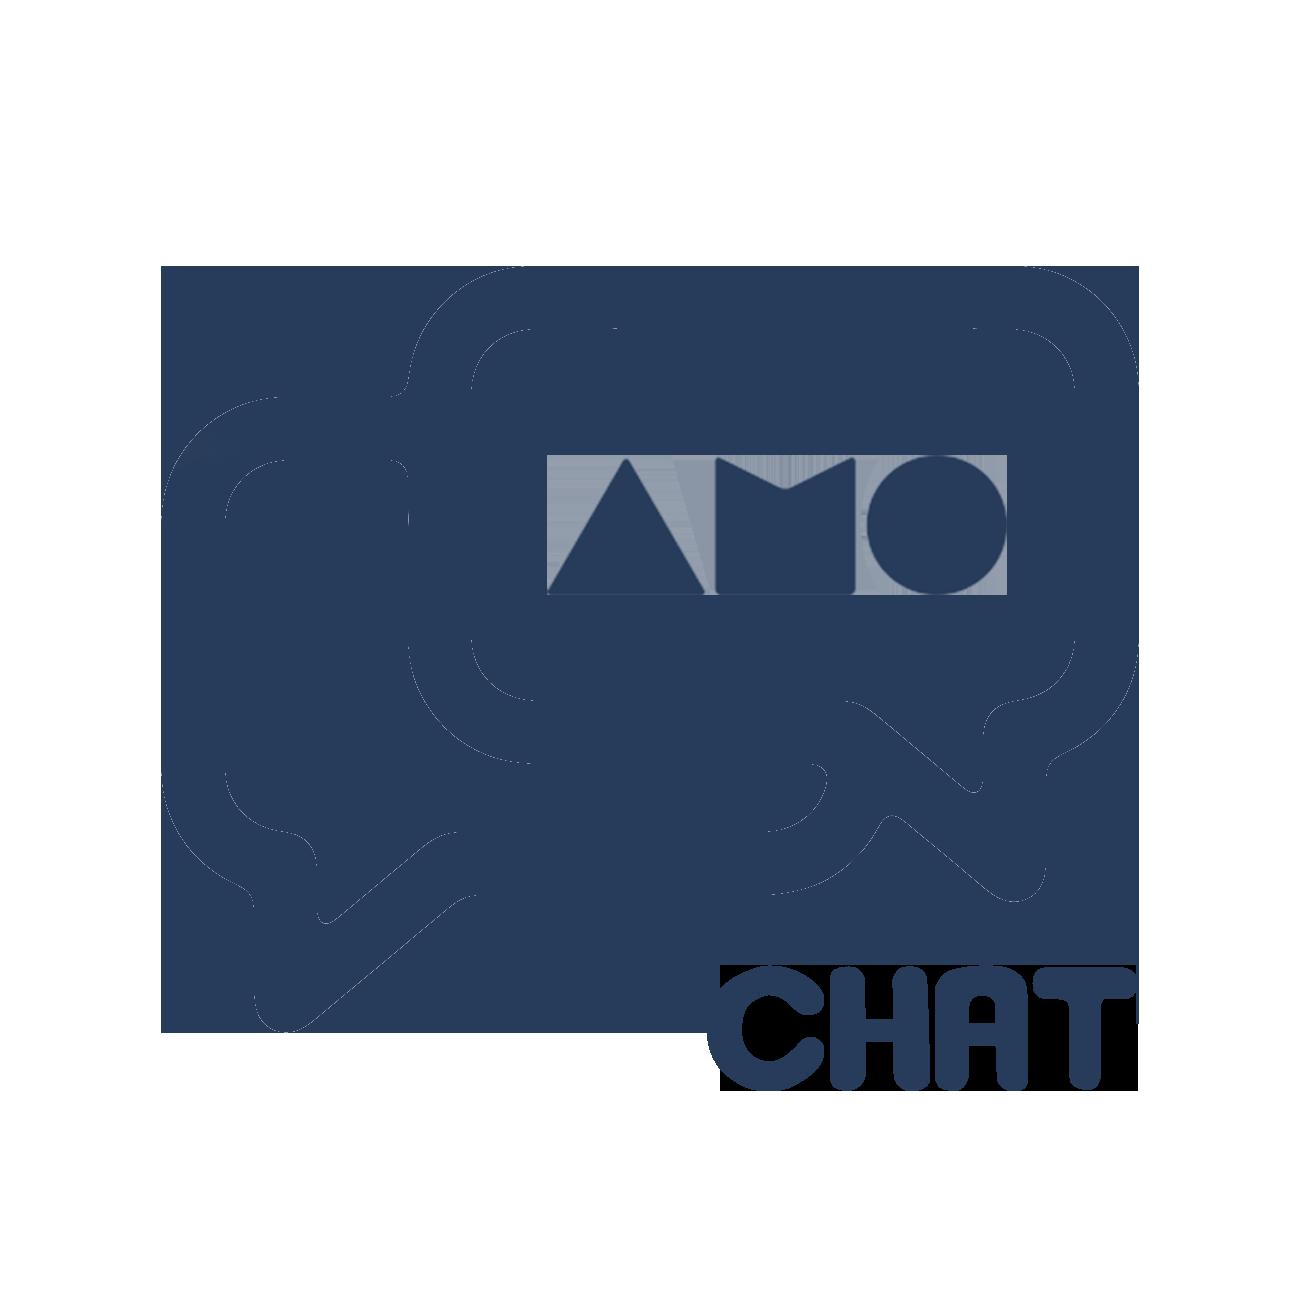 AMO Chat